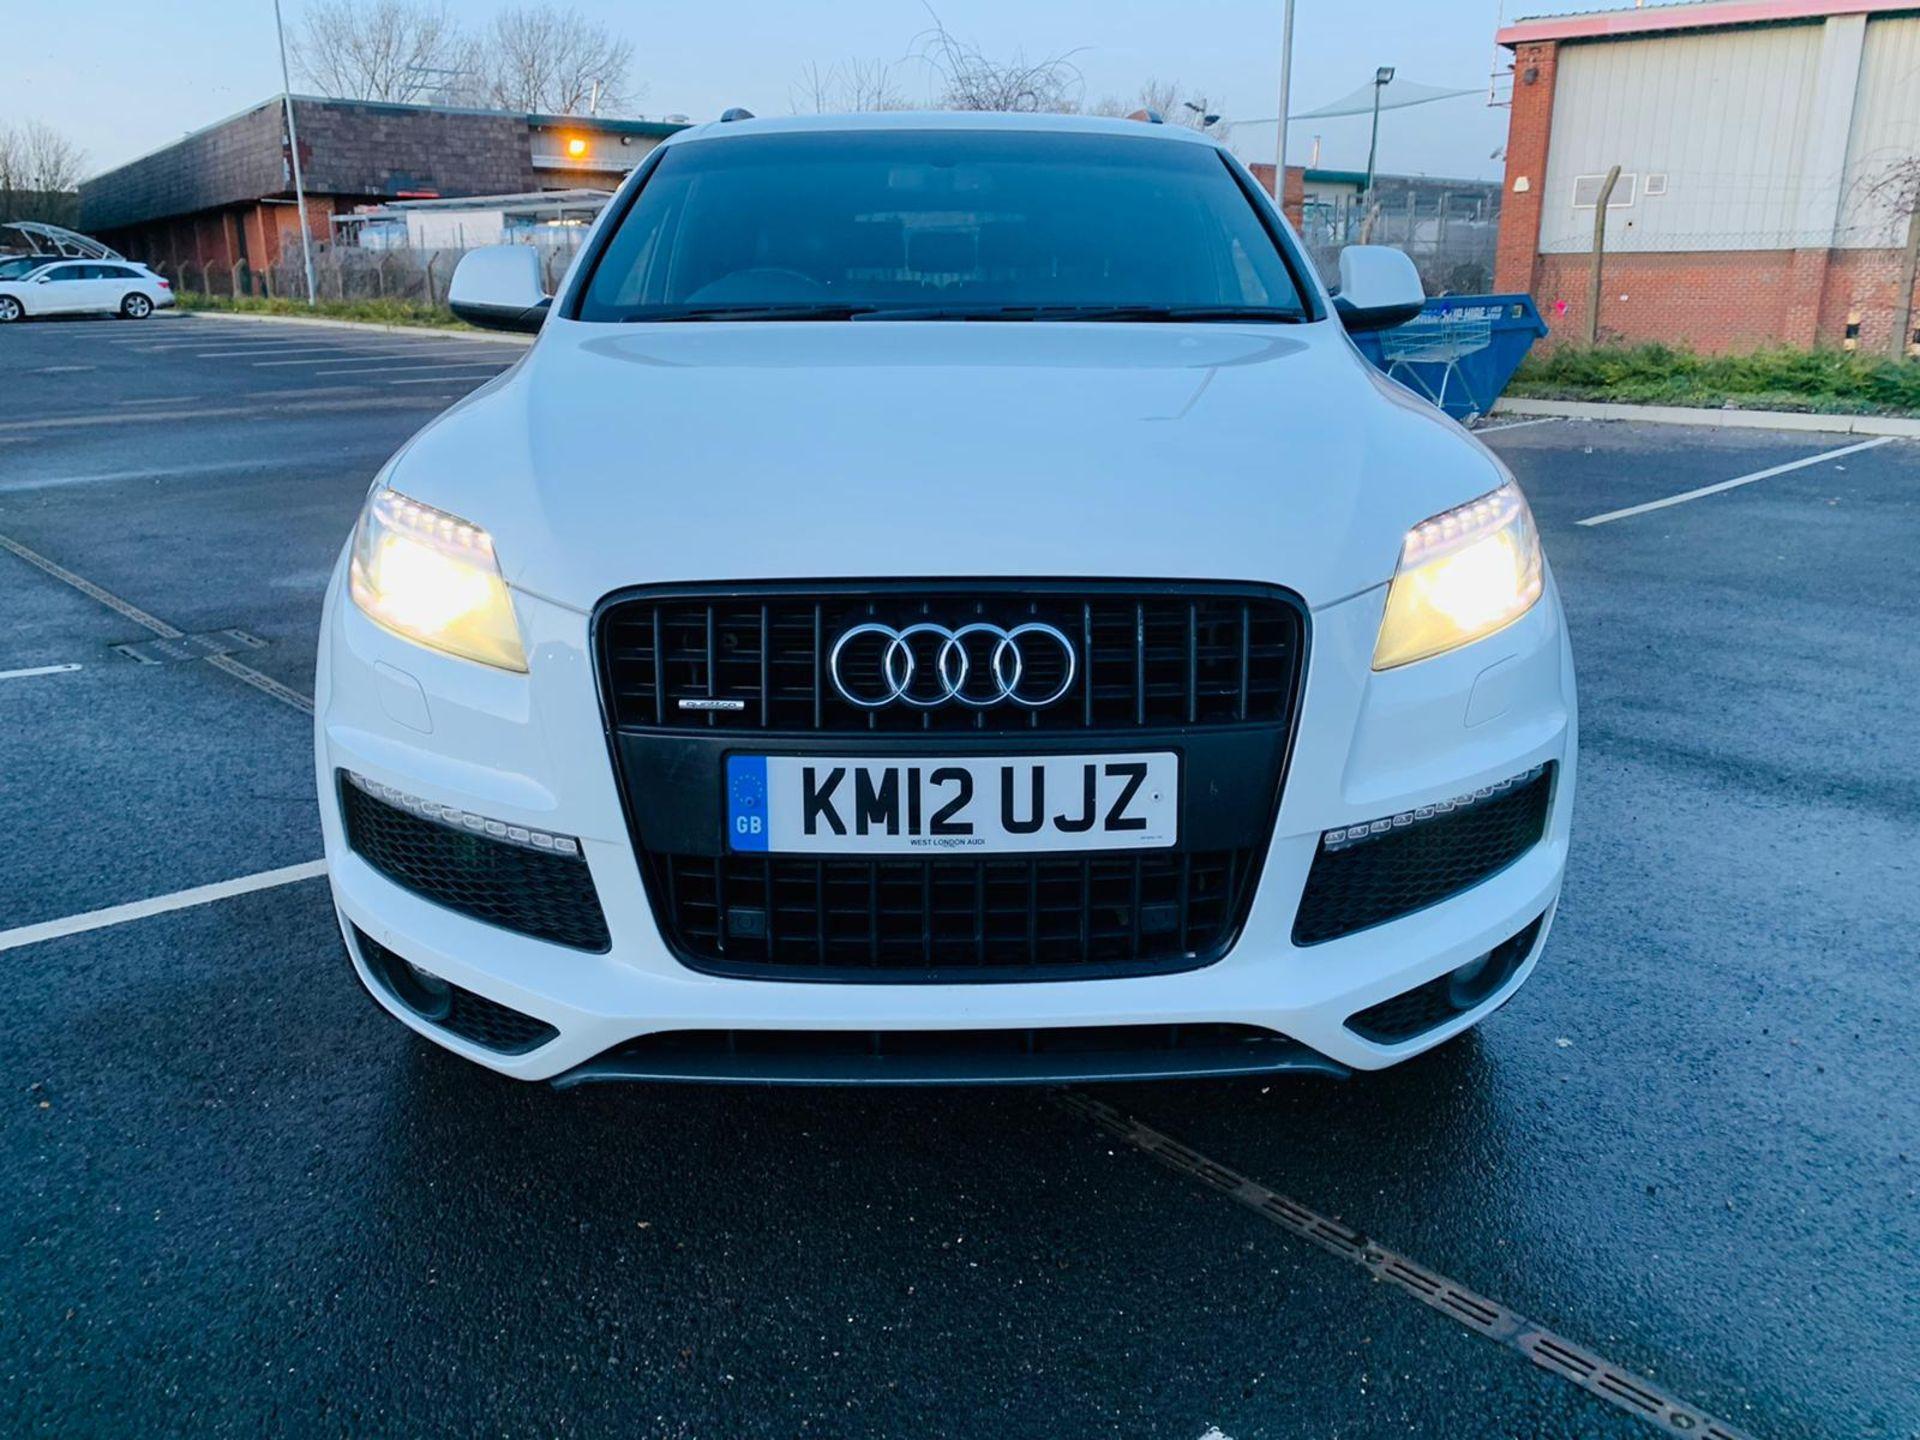 (Reserve Met)Audi Q7 3.0 TDI Quattro S Line Plus Auto (7 Seats) - 12 Reg - Only 63k Miles -Sat Nav- - Image 6 of 37